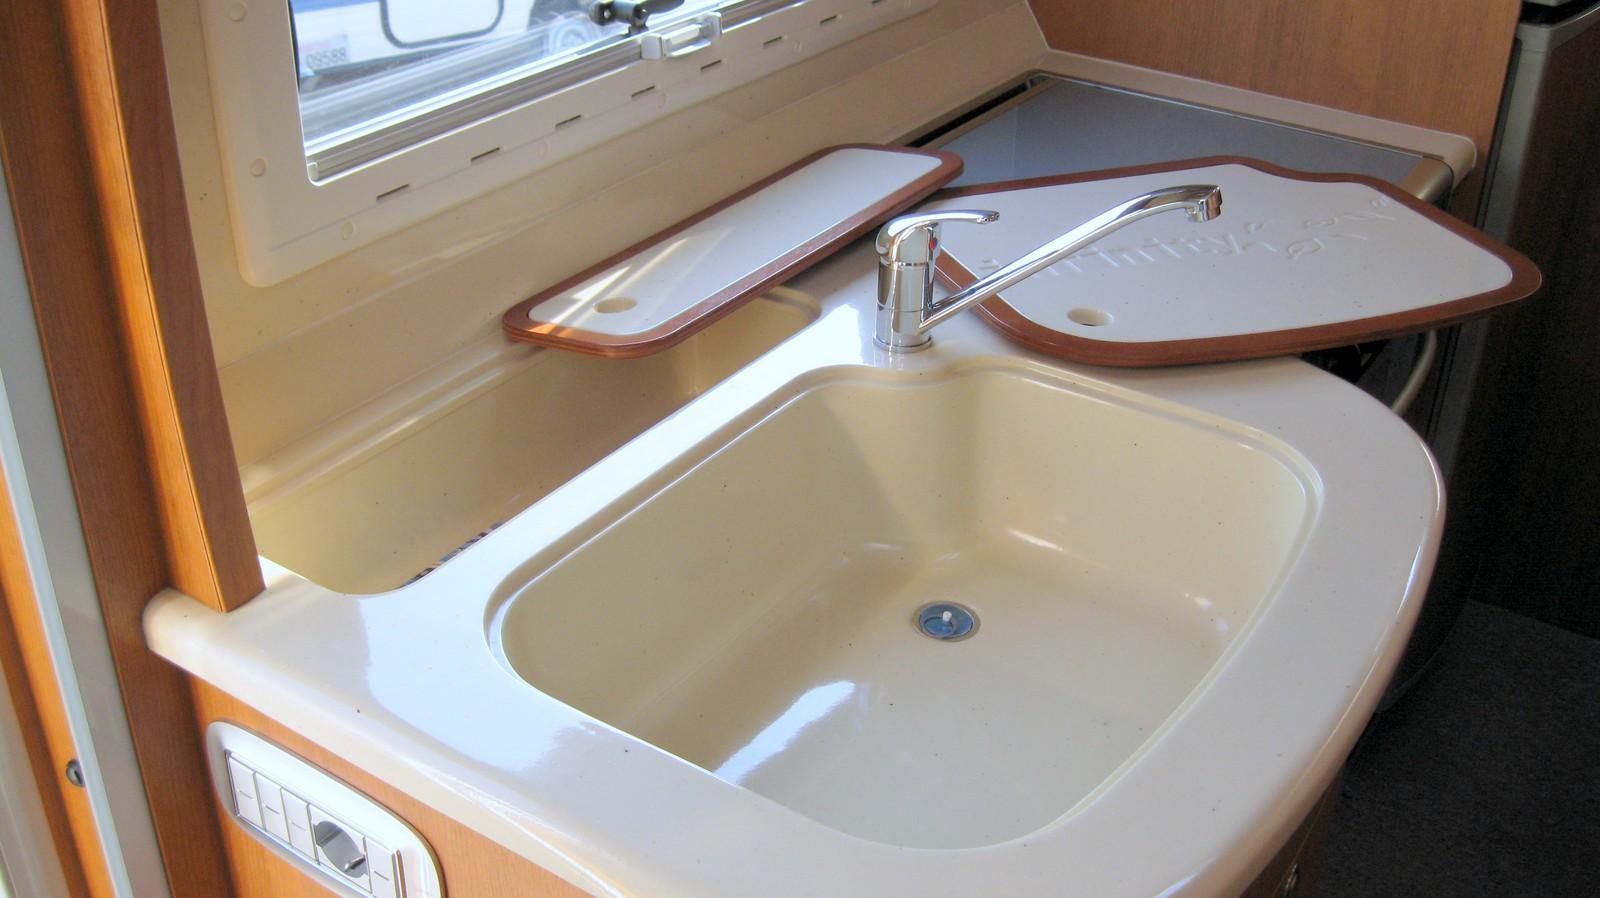 Lavabo Esterno Moderno : Lavandino esterno moderno amazing lavatoio with lavandino esterno